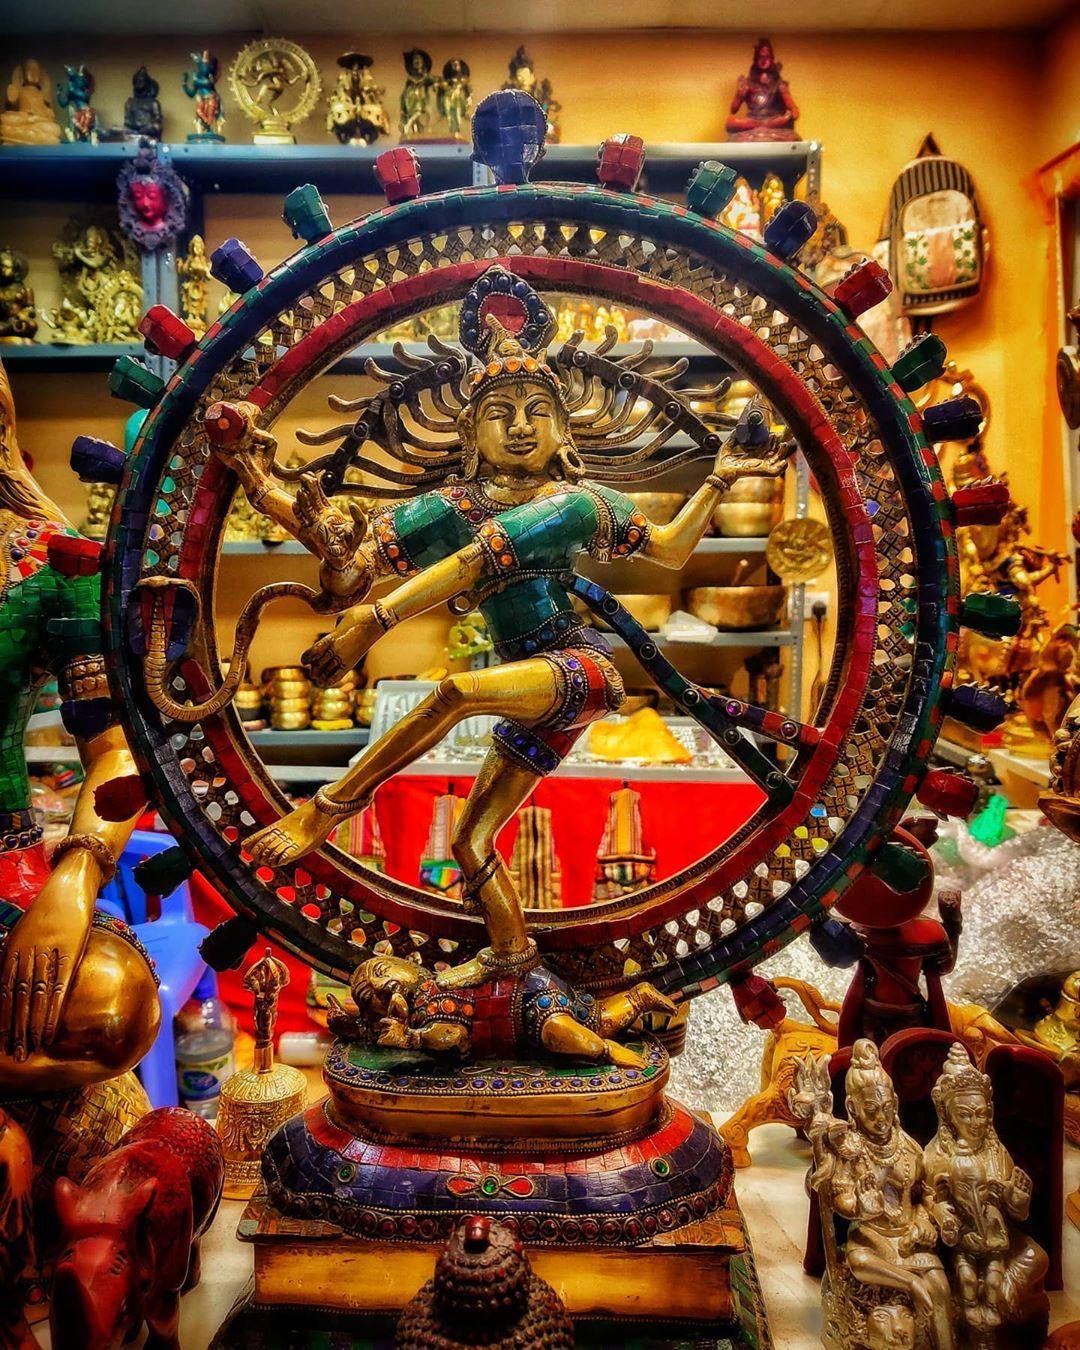 Chidambaram Thillai Nataraja Temple Timings, History